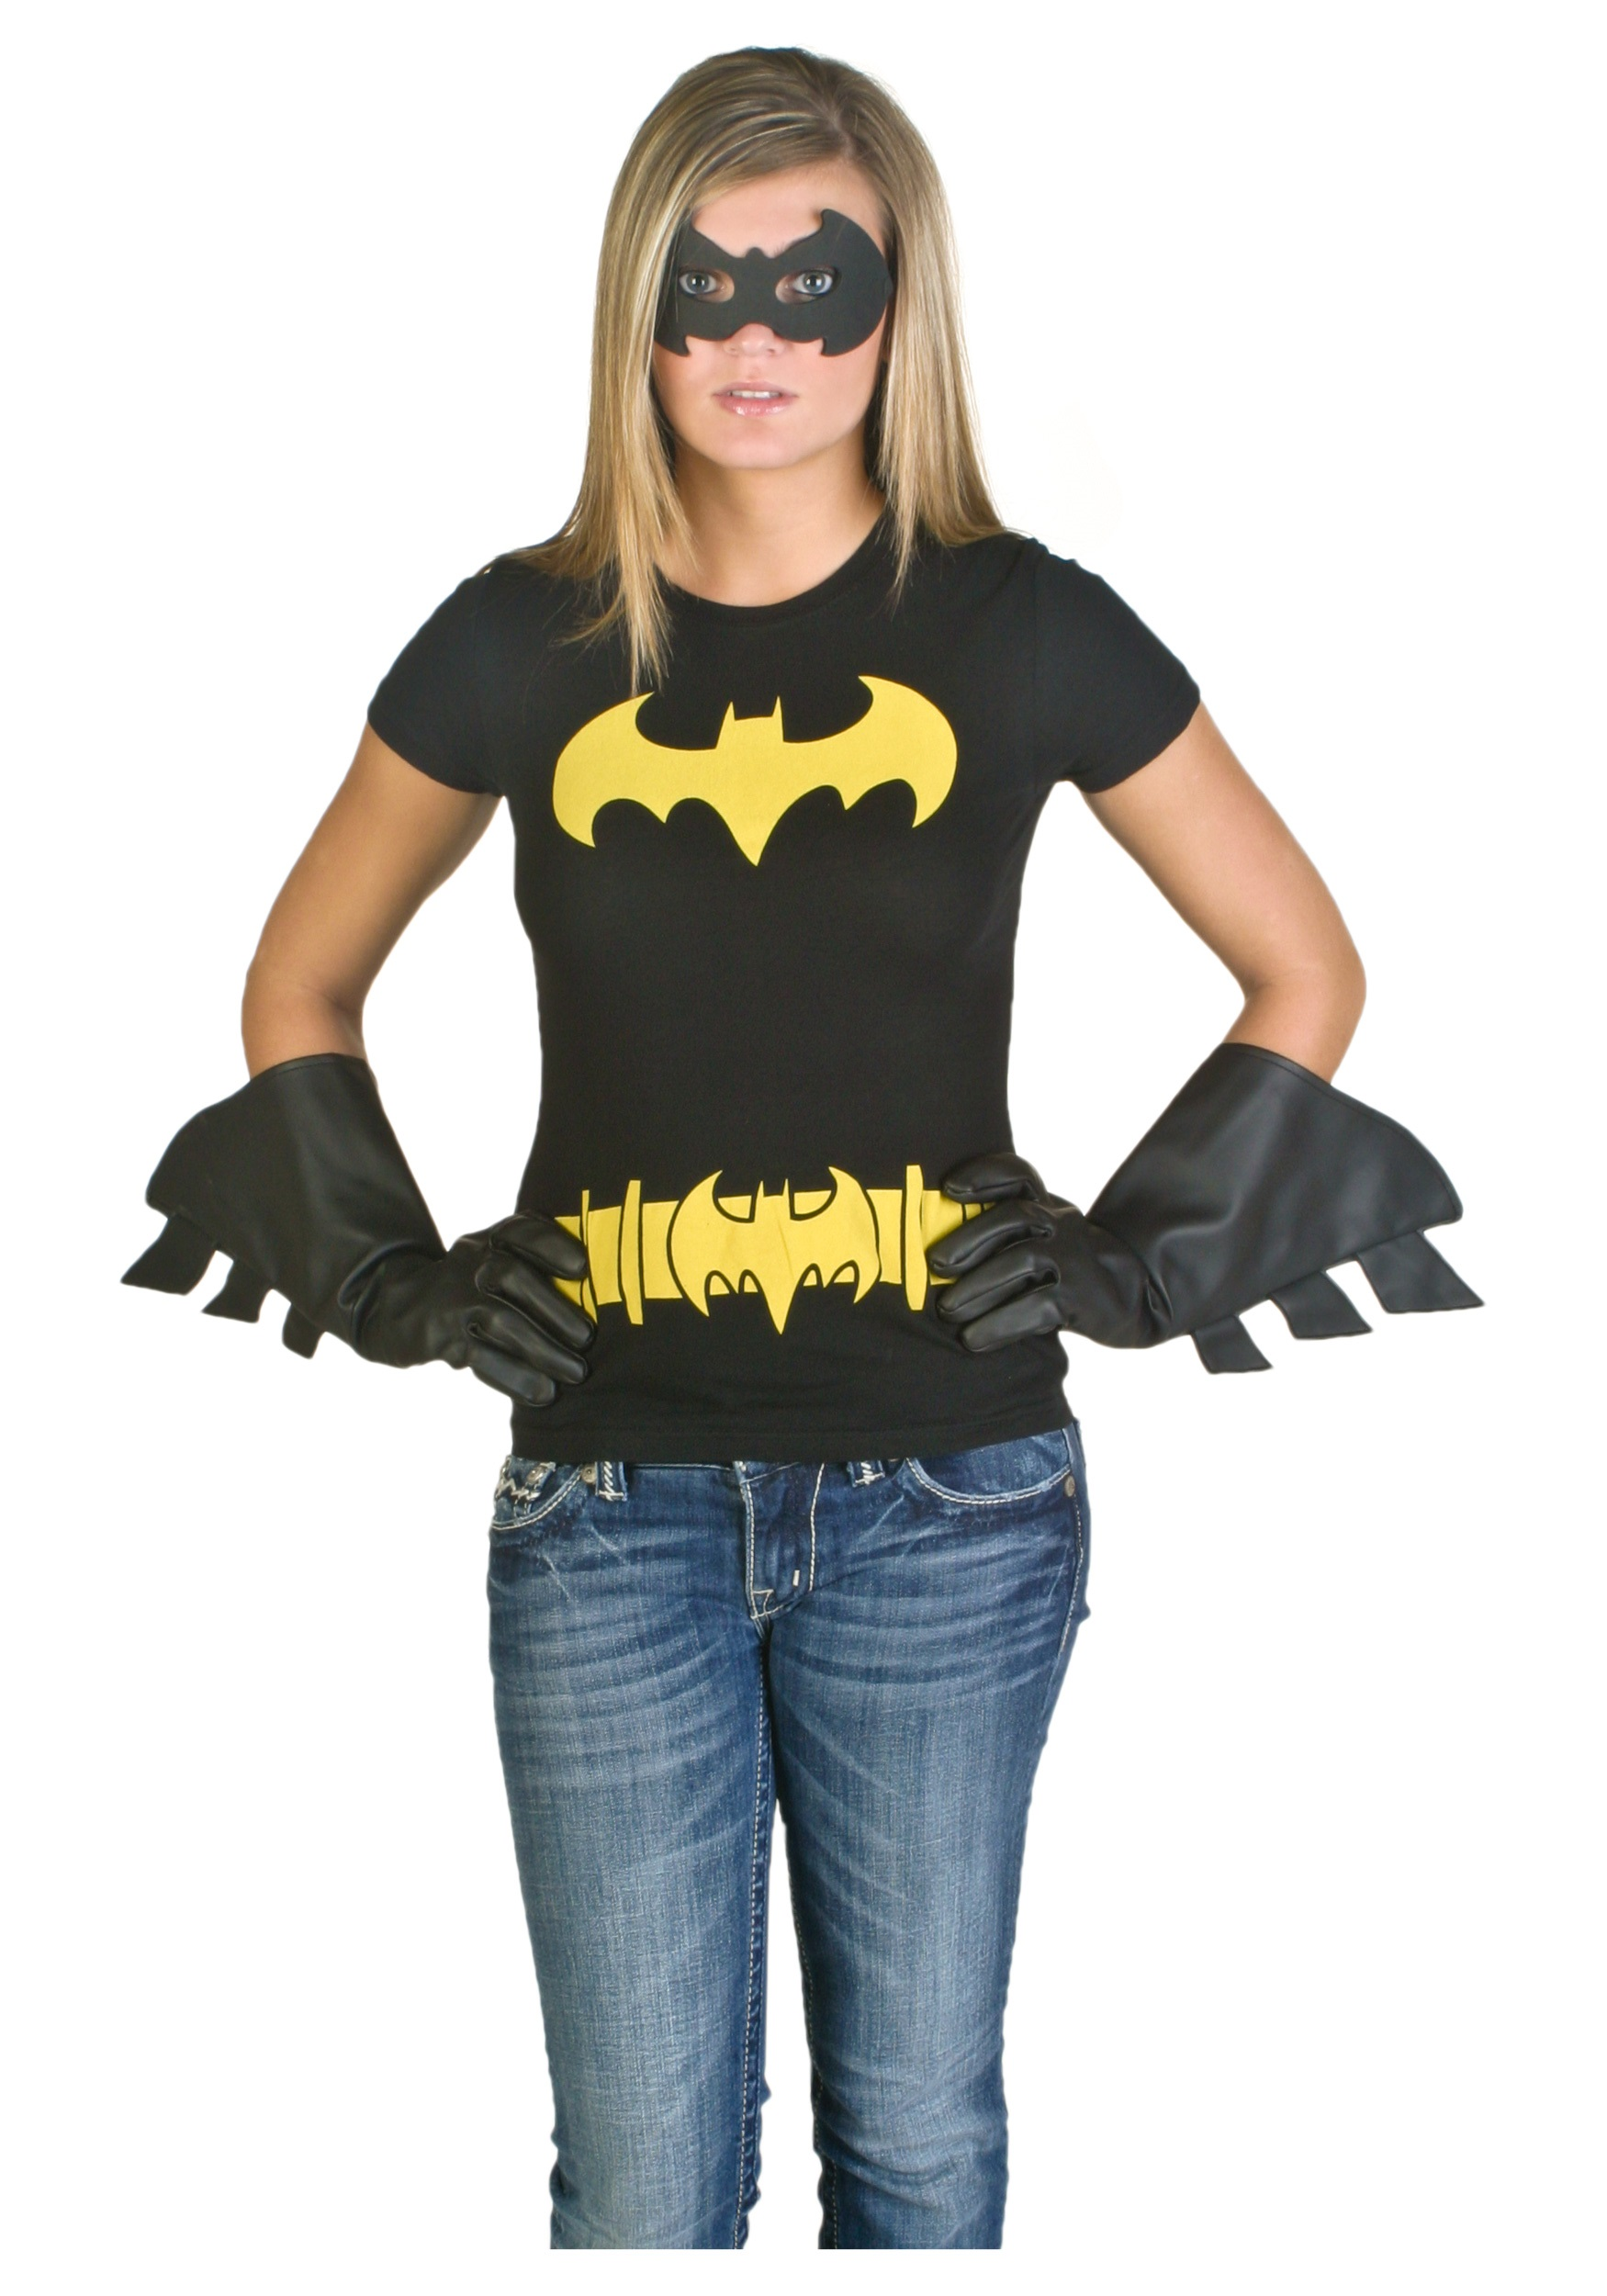 Batgirl Costume T-Shirt  sc 1 st  Halloween Costumes & Batgirl Costume T-Shirt - Halloween Costumes